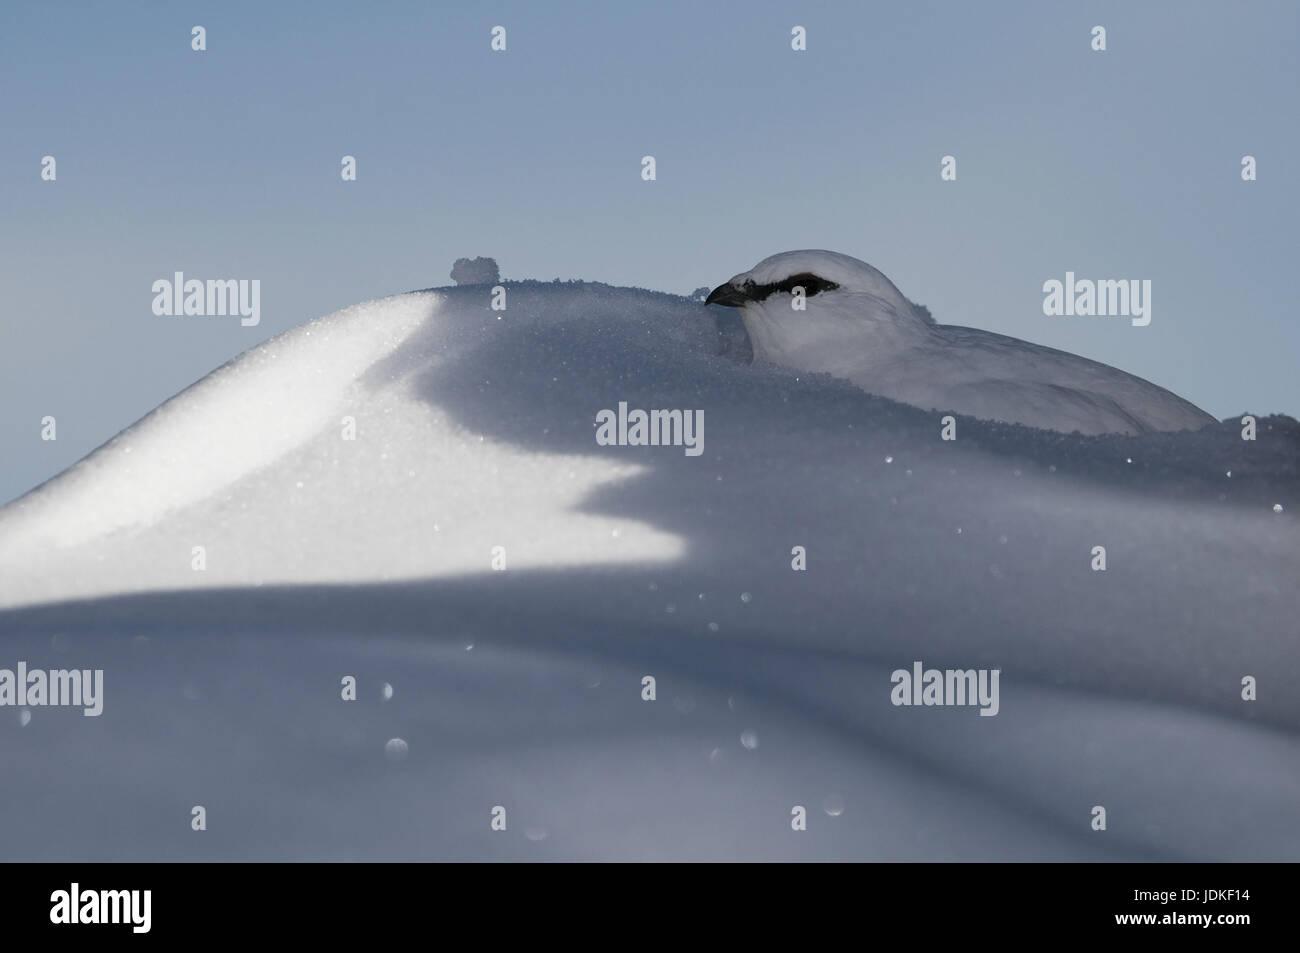 Alptraum Schneehuhn, Kleid Lagopus Muta, Schneehuhn, Alptraum Schneehuhn im Winter in den Schnee, Alpenschneehuhn, Stockbild